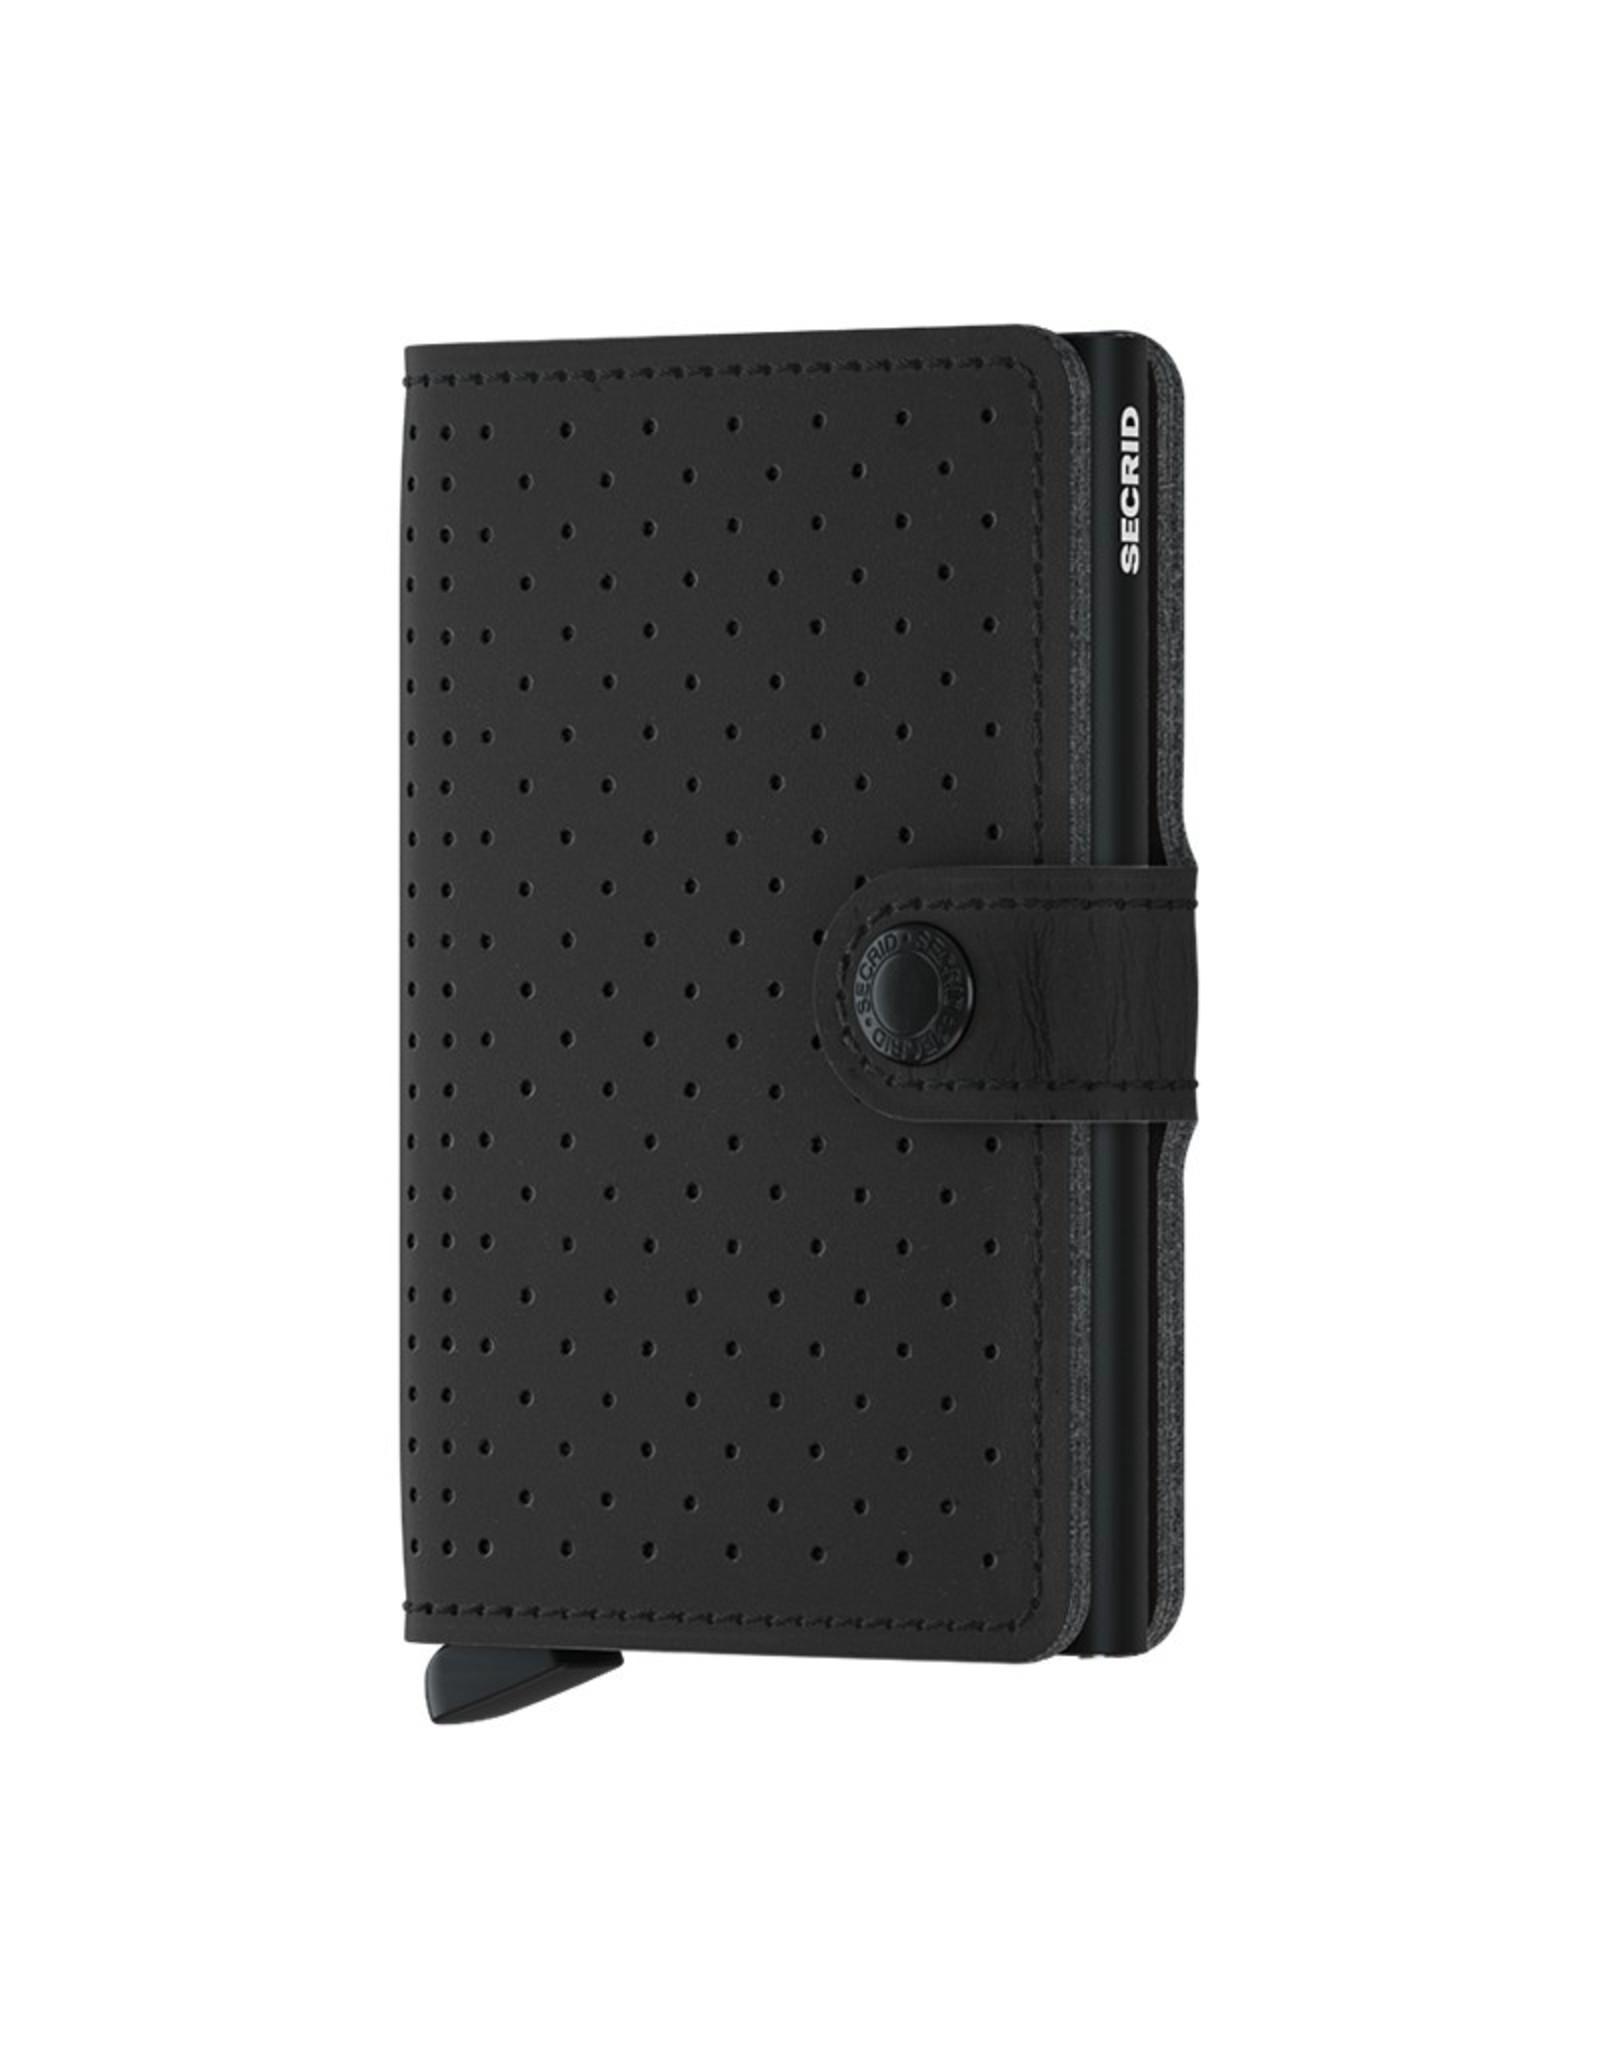 Secrid Wallets Secrid Miniwallet Perforated Black